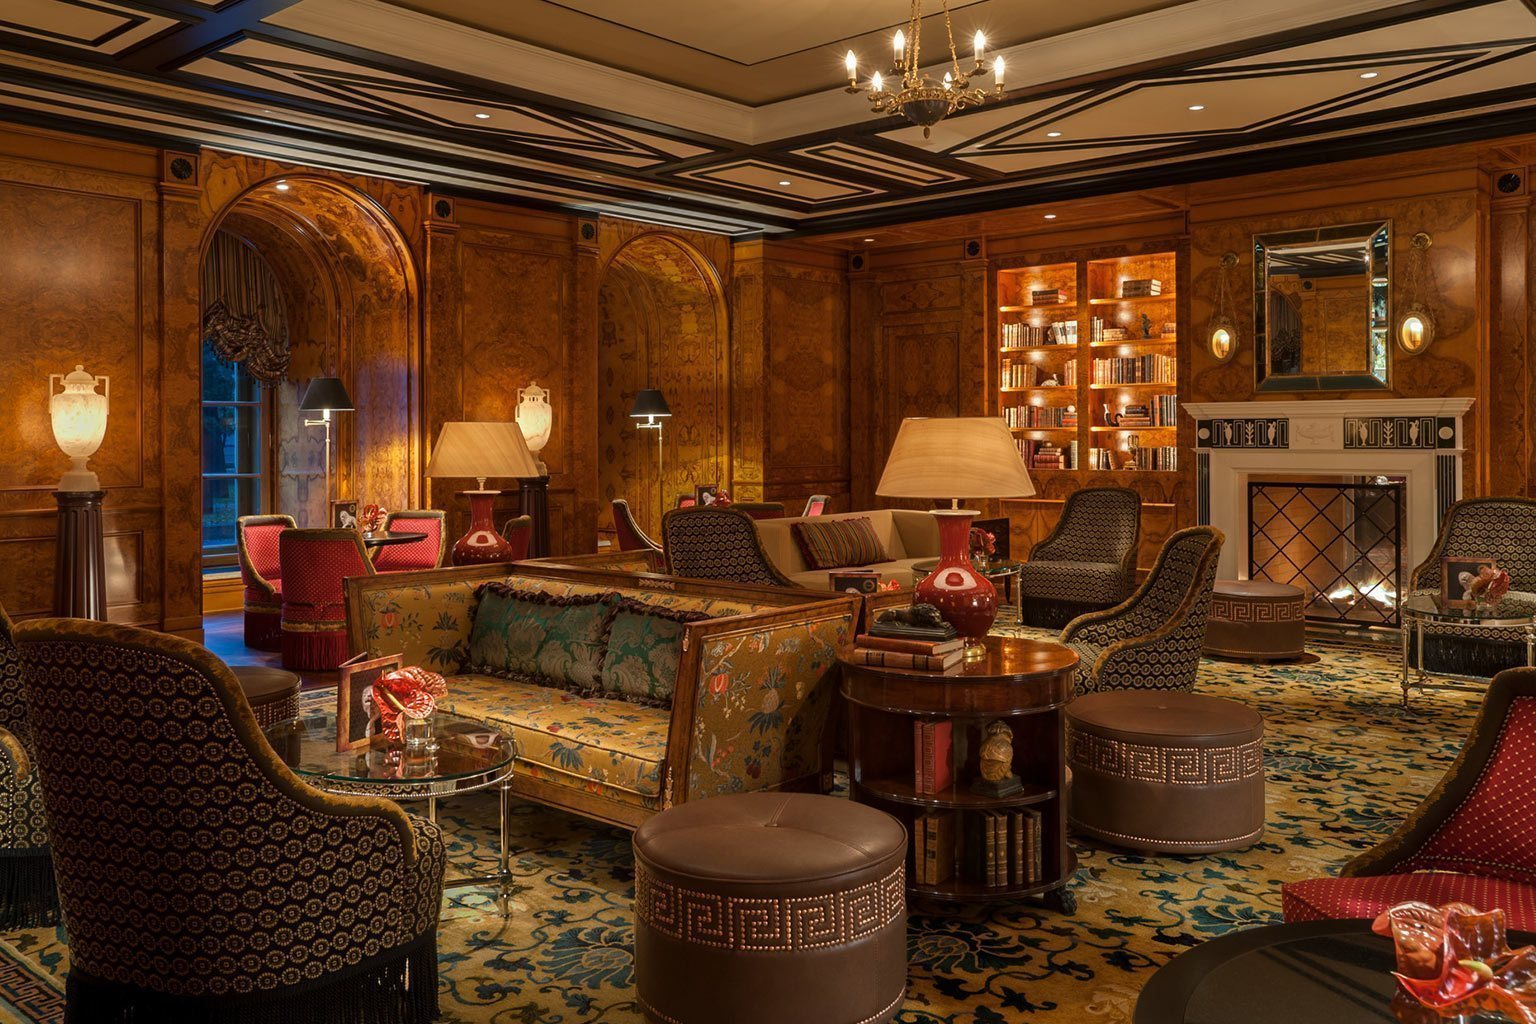 Four Seasons Hotel Lion S Palace St Petersburg Designreisen